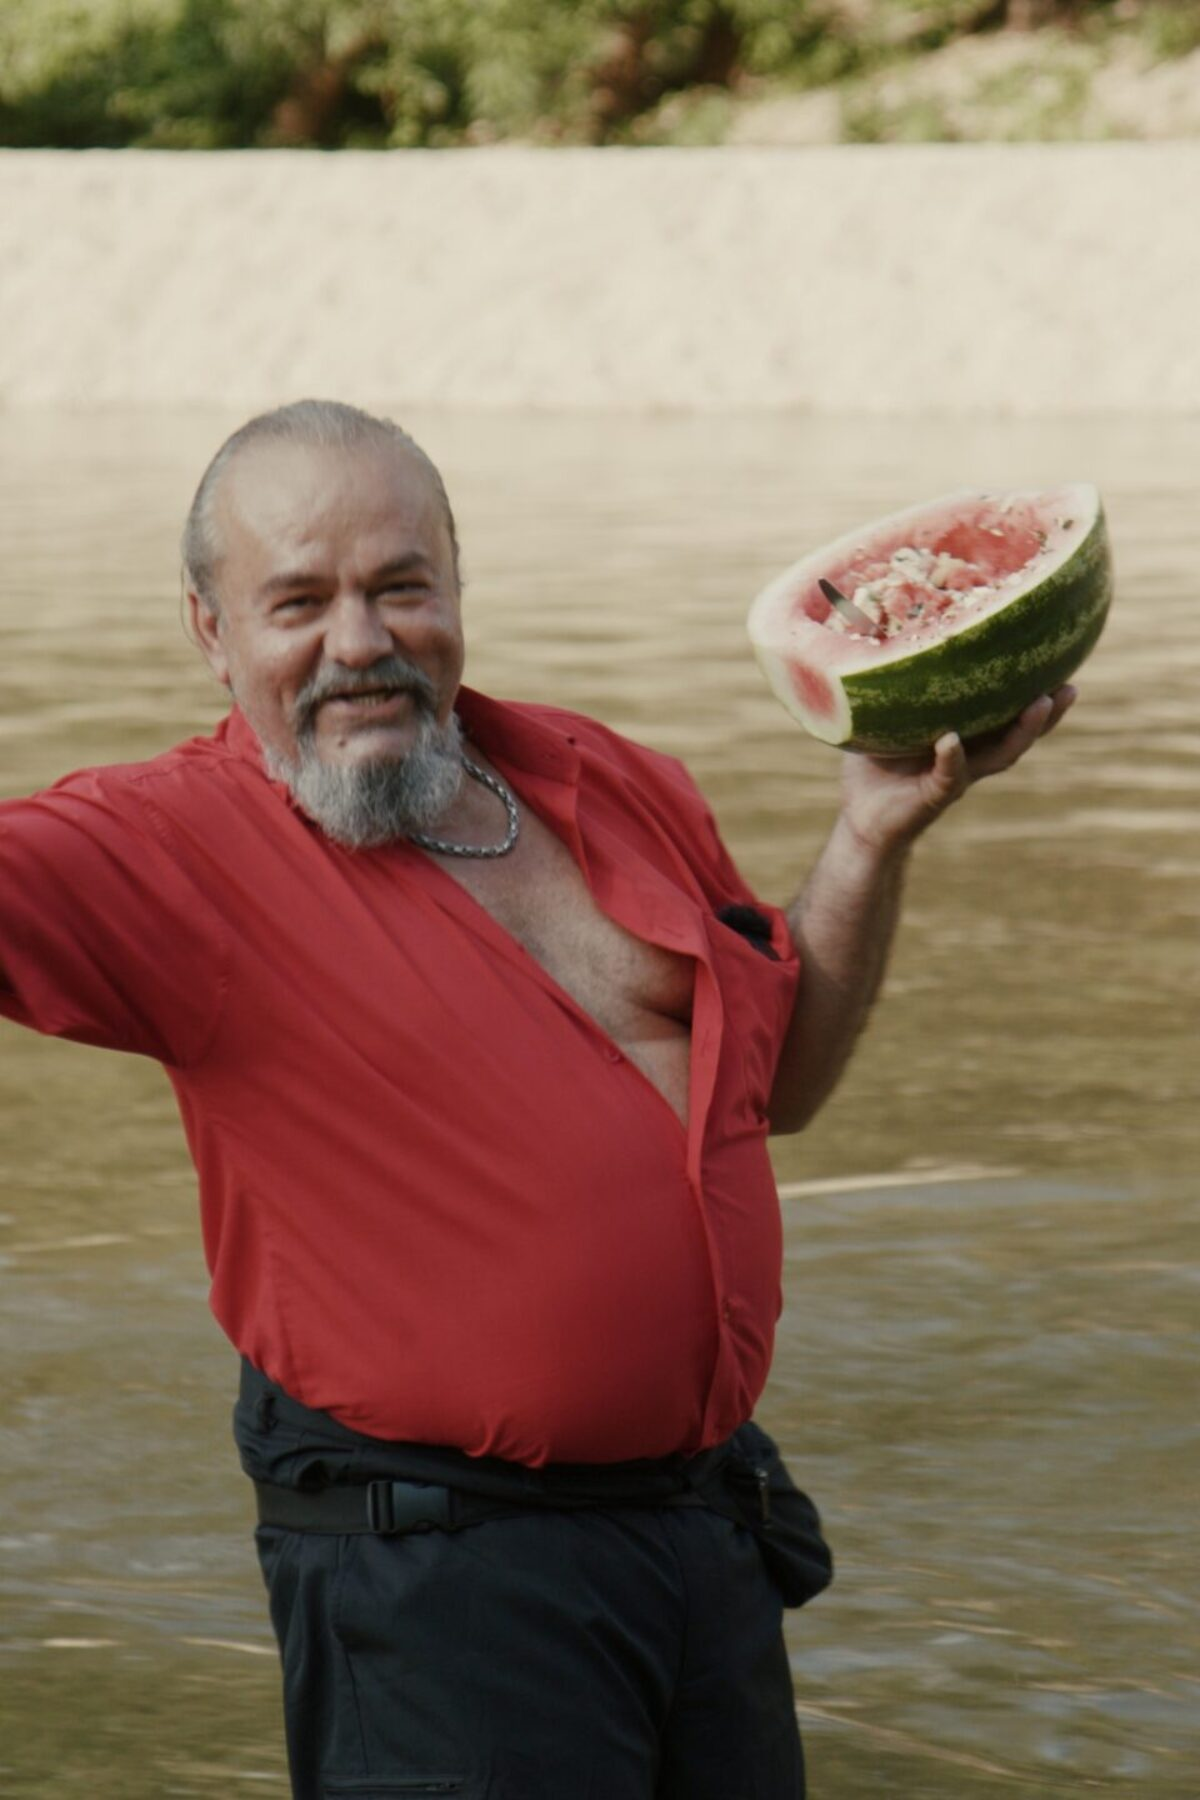 Griechischer Wassermelonensalat mit Feta